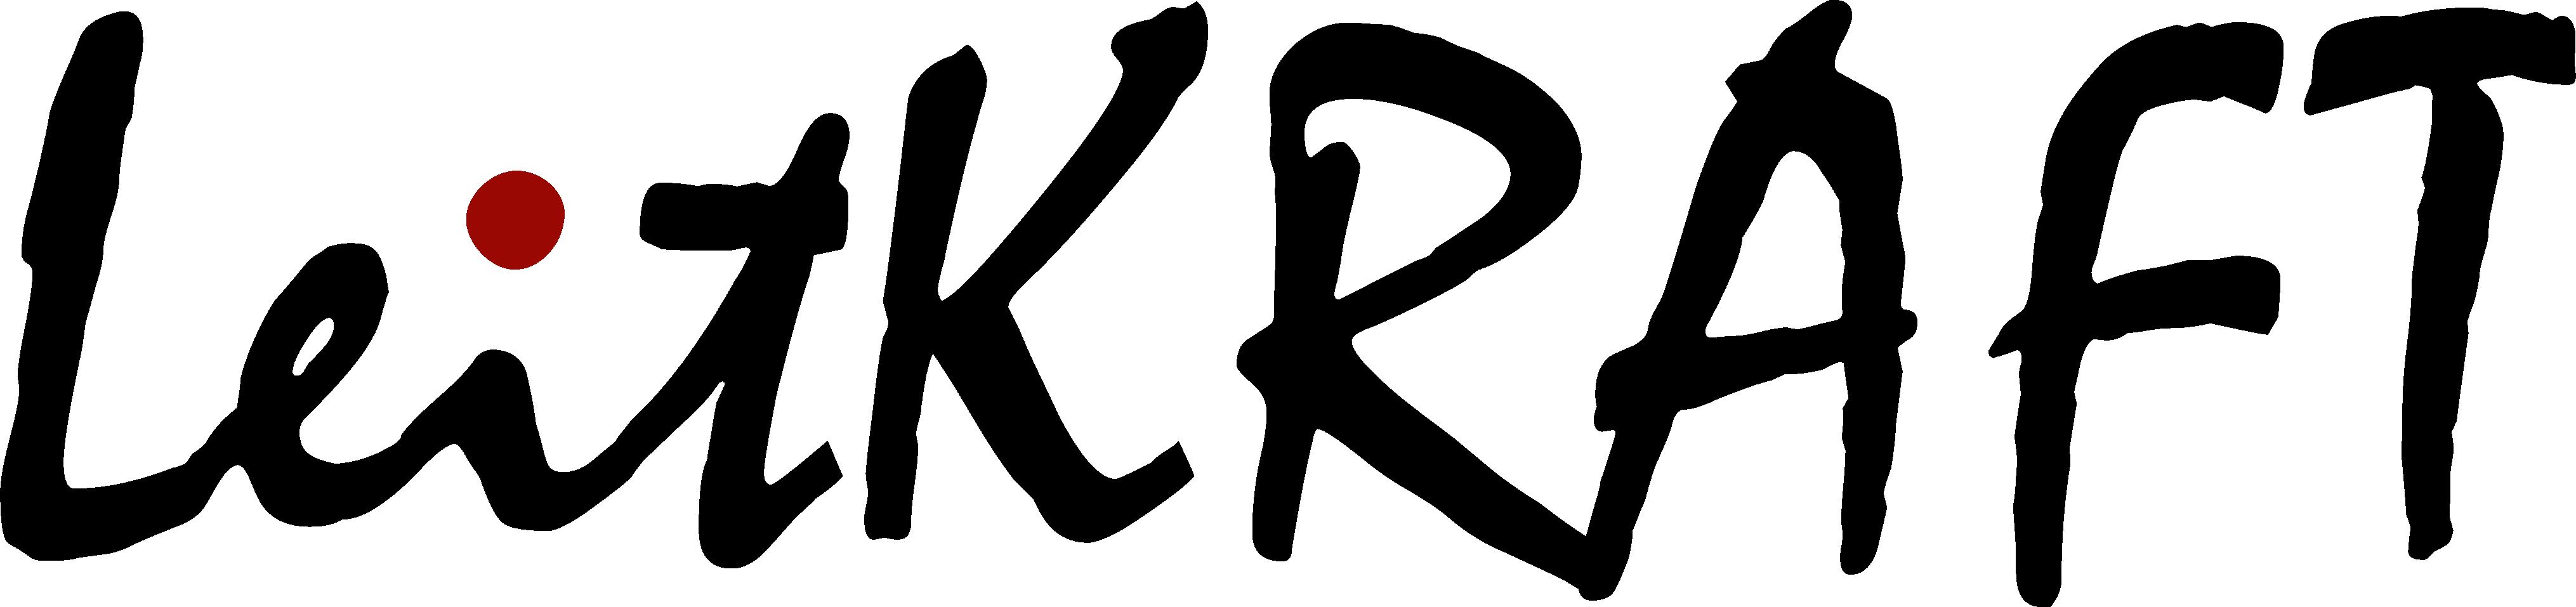 landepunktakademie.de